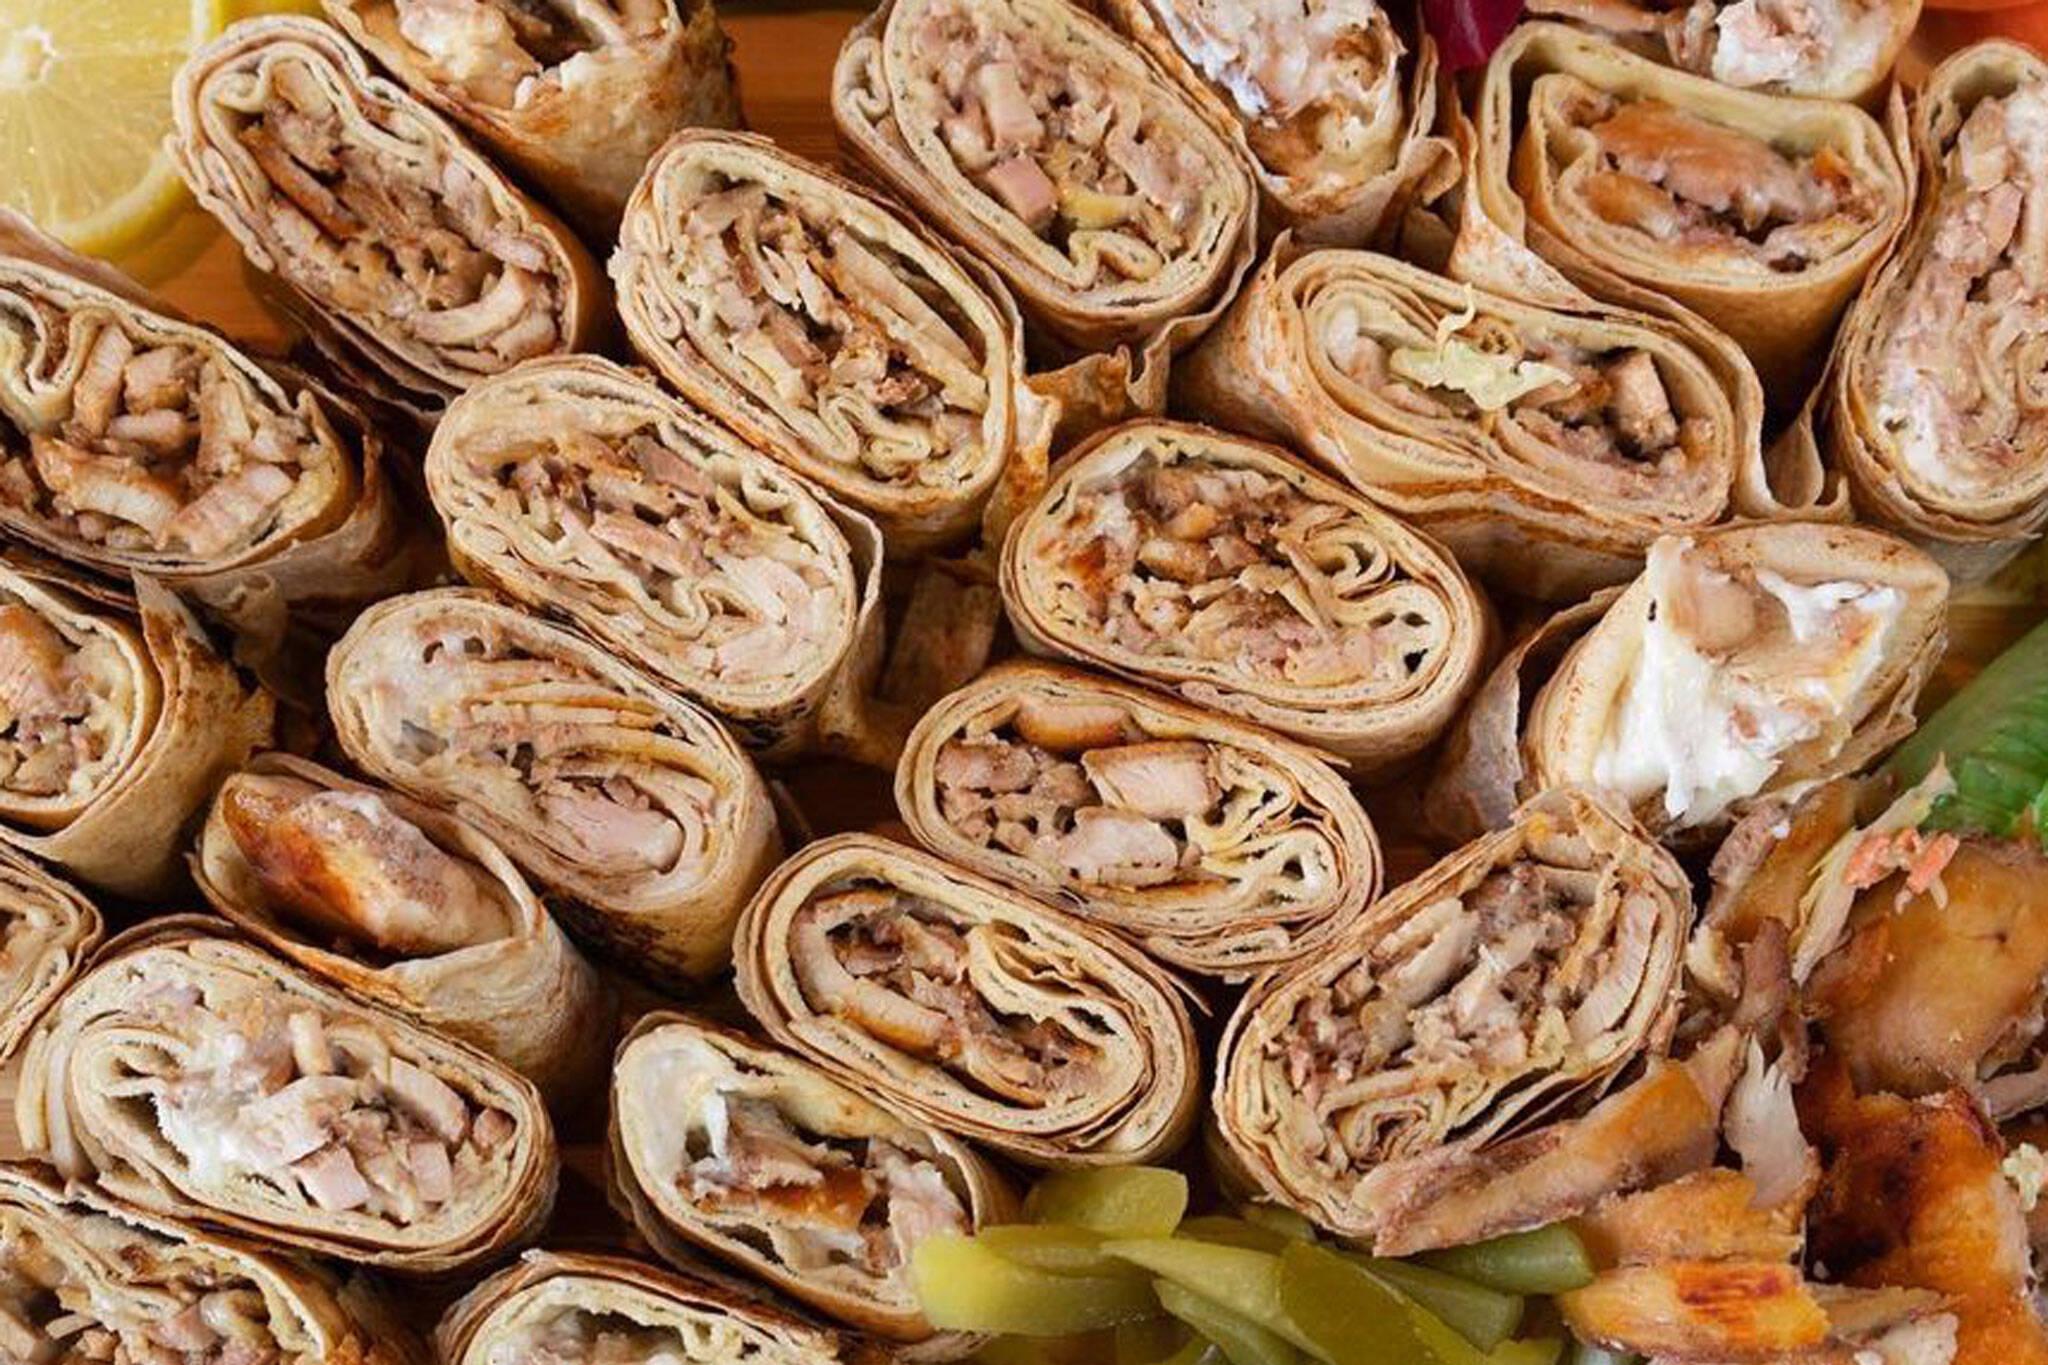 shawarma royale toronto